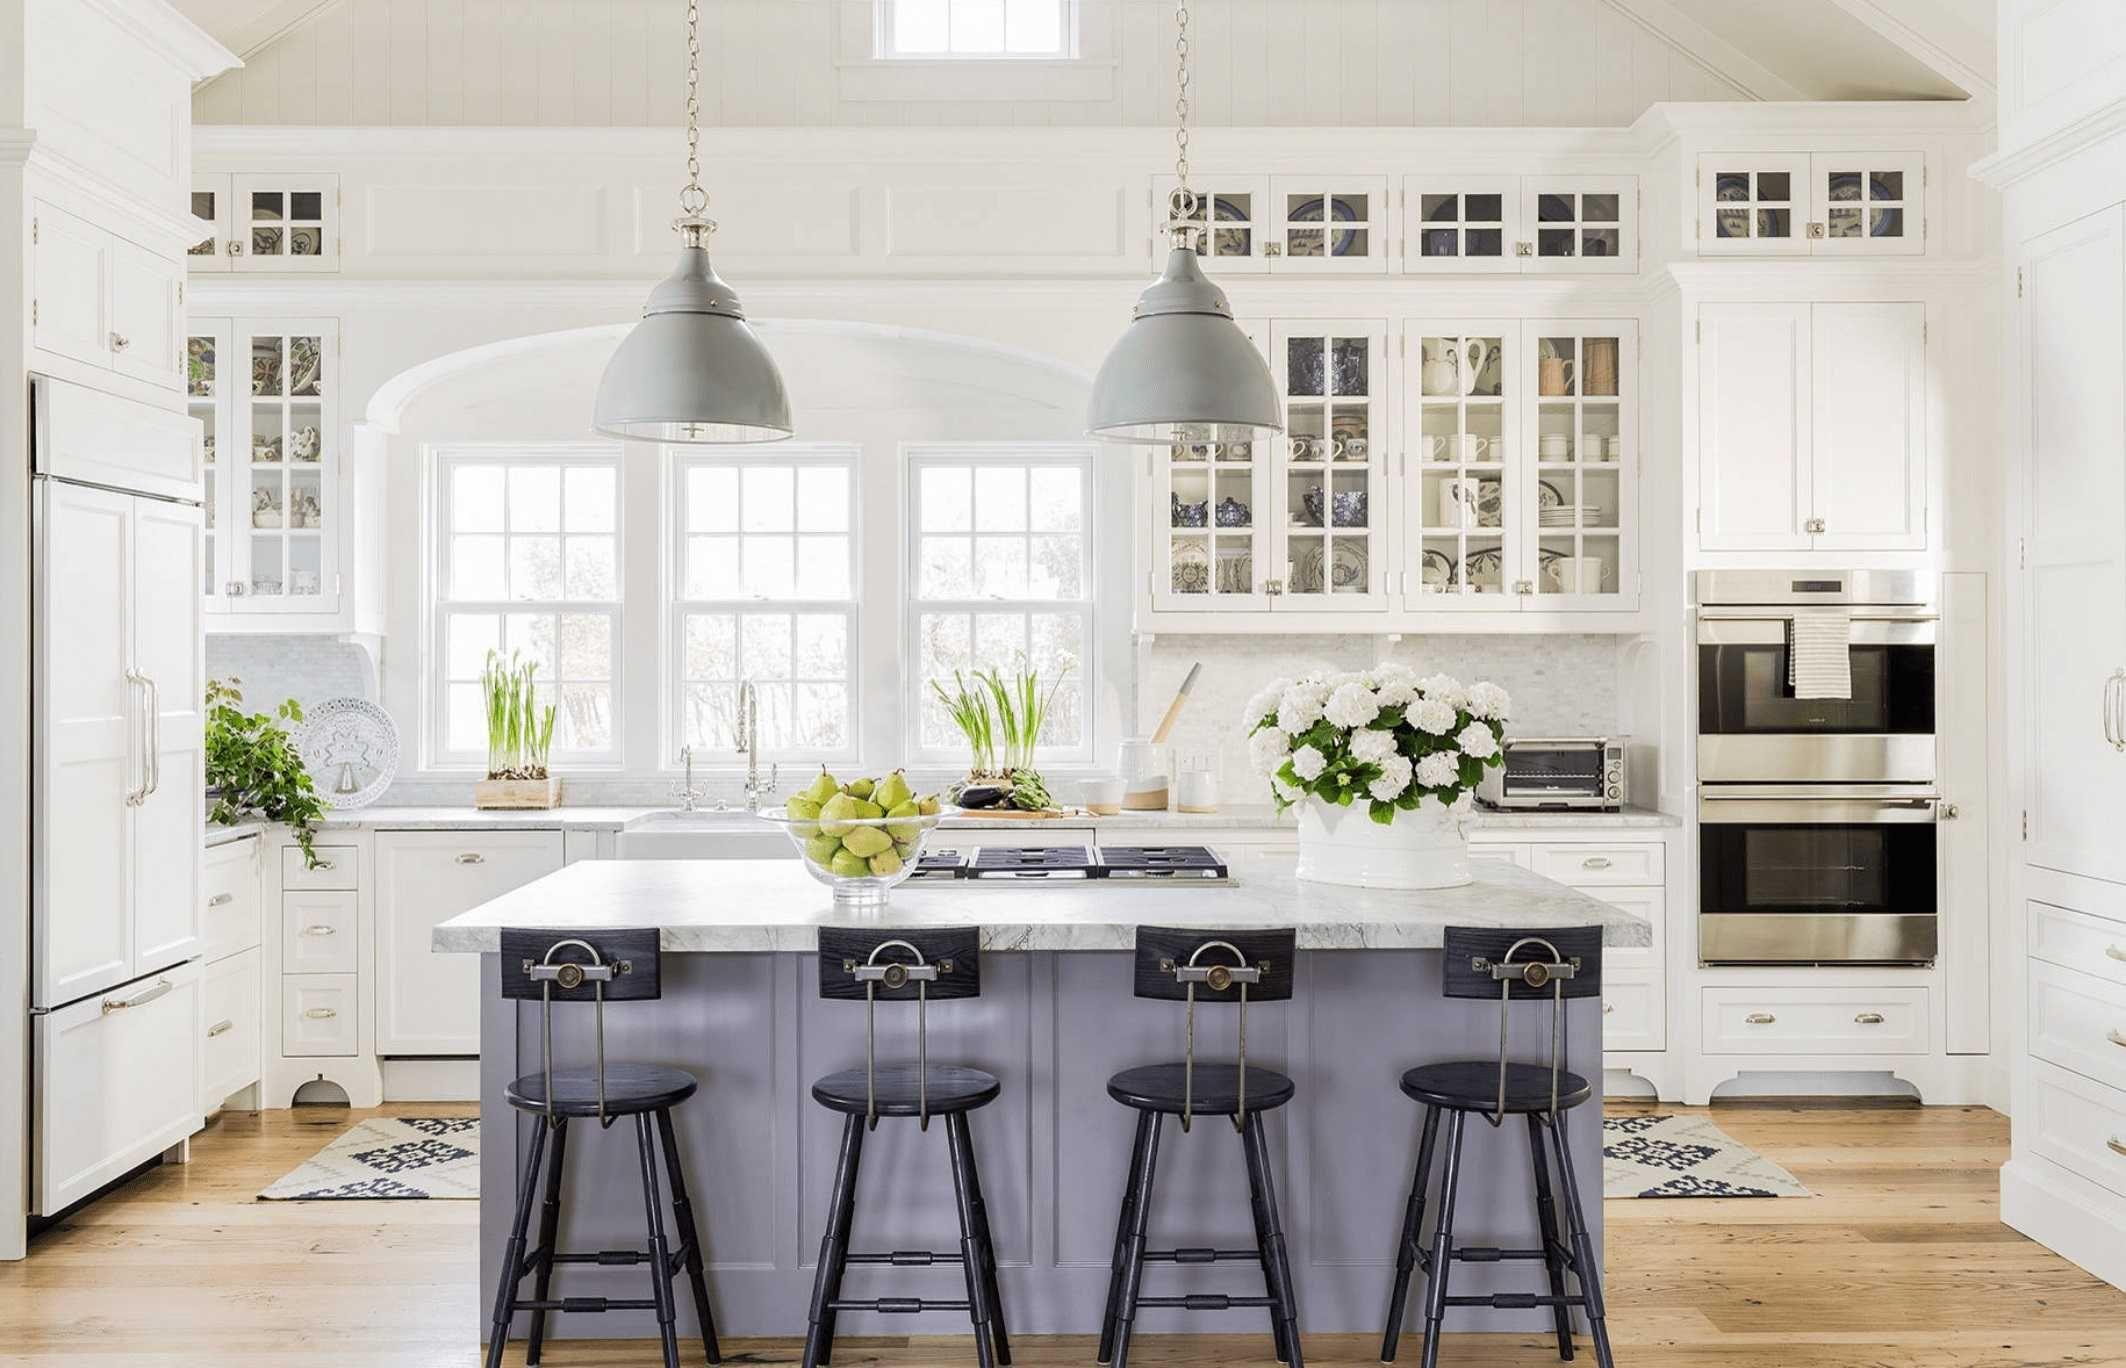 Image Result For American Classic Style Interior Design Kuhnya Mechty Interer Kuhni Interer